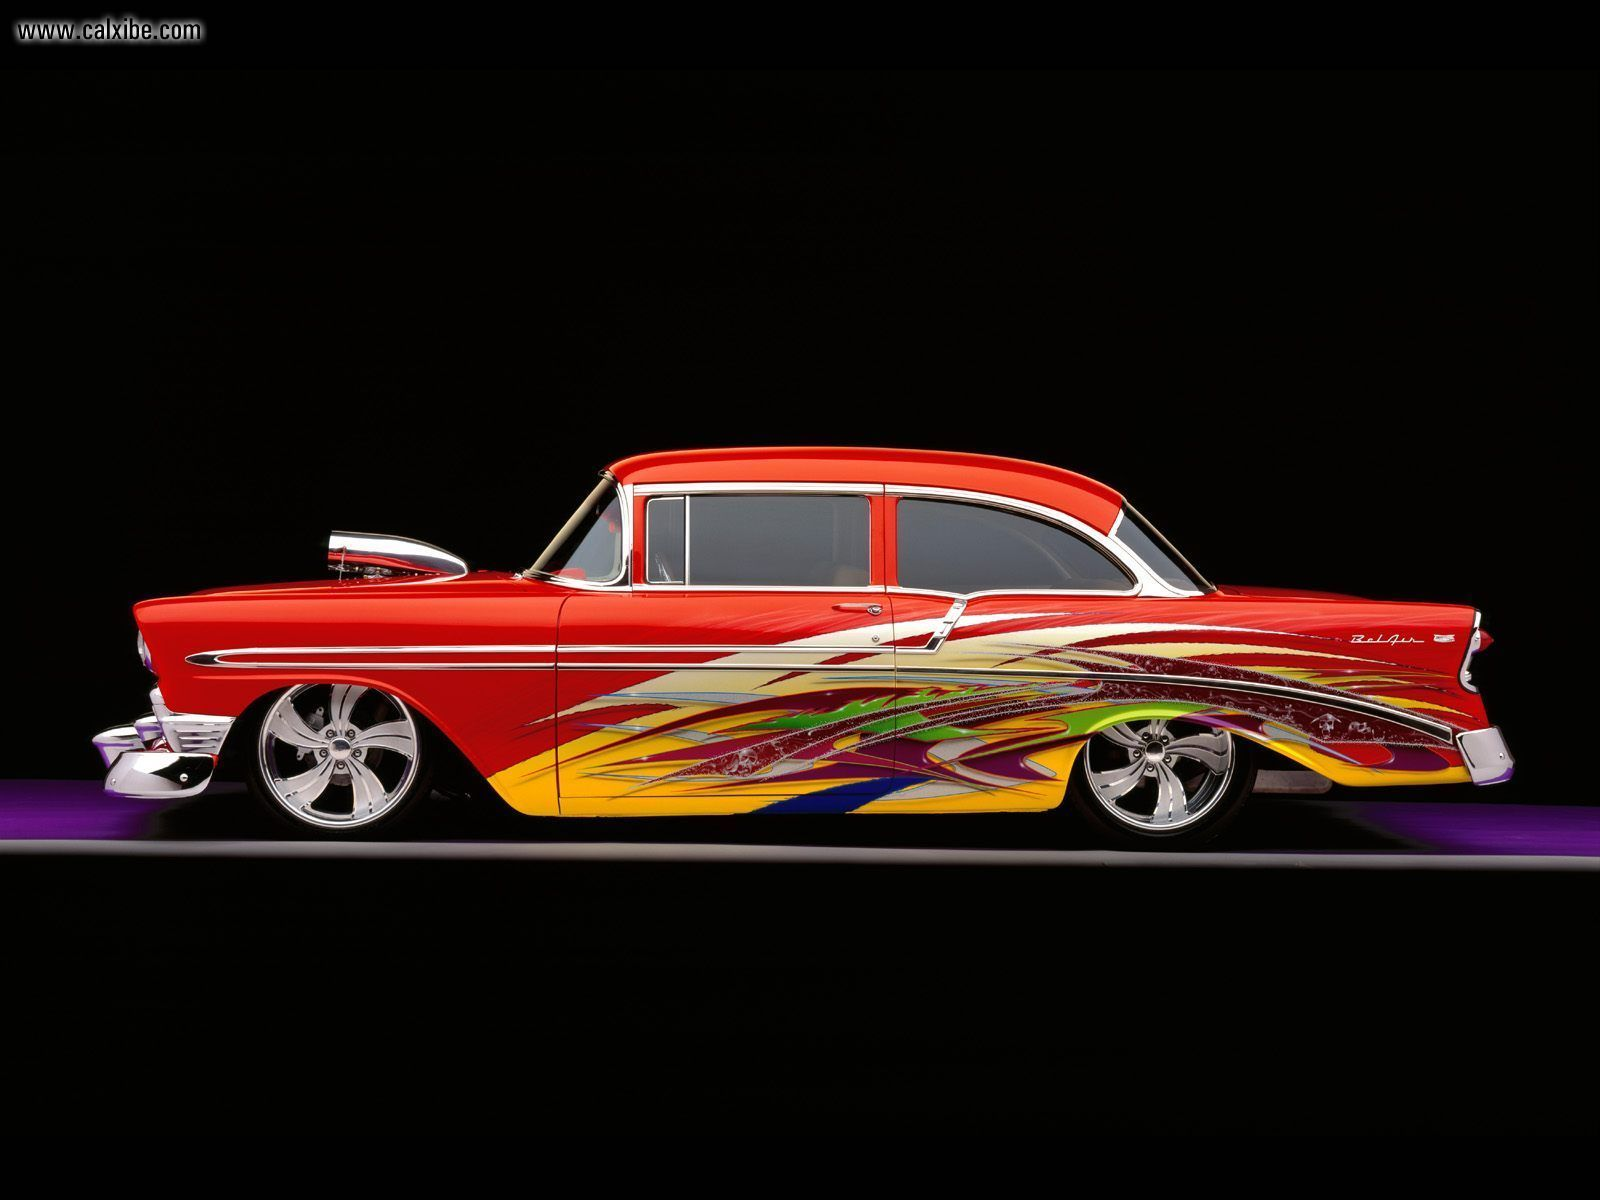 Cars 1956 Custom Chevy Bel Air desktop wallpaper nr 18406 1600x1200